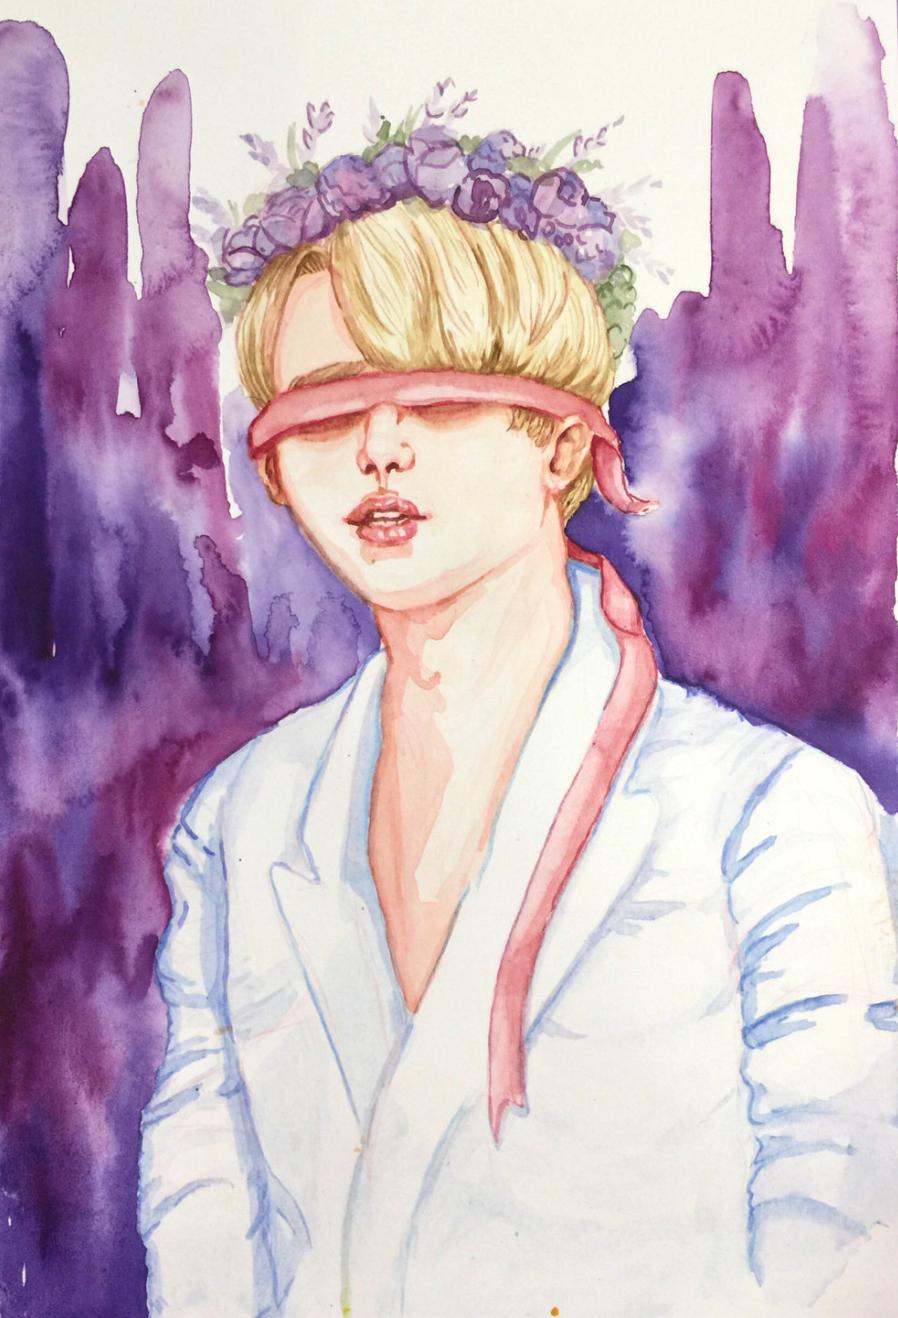 Watercolor by Leela Trumbo